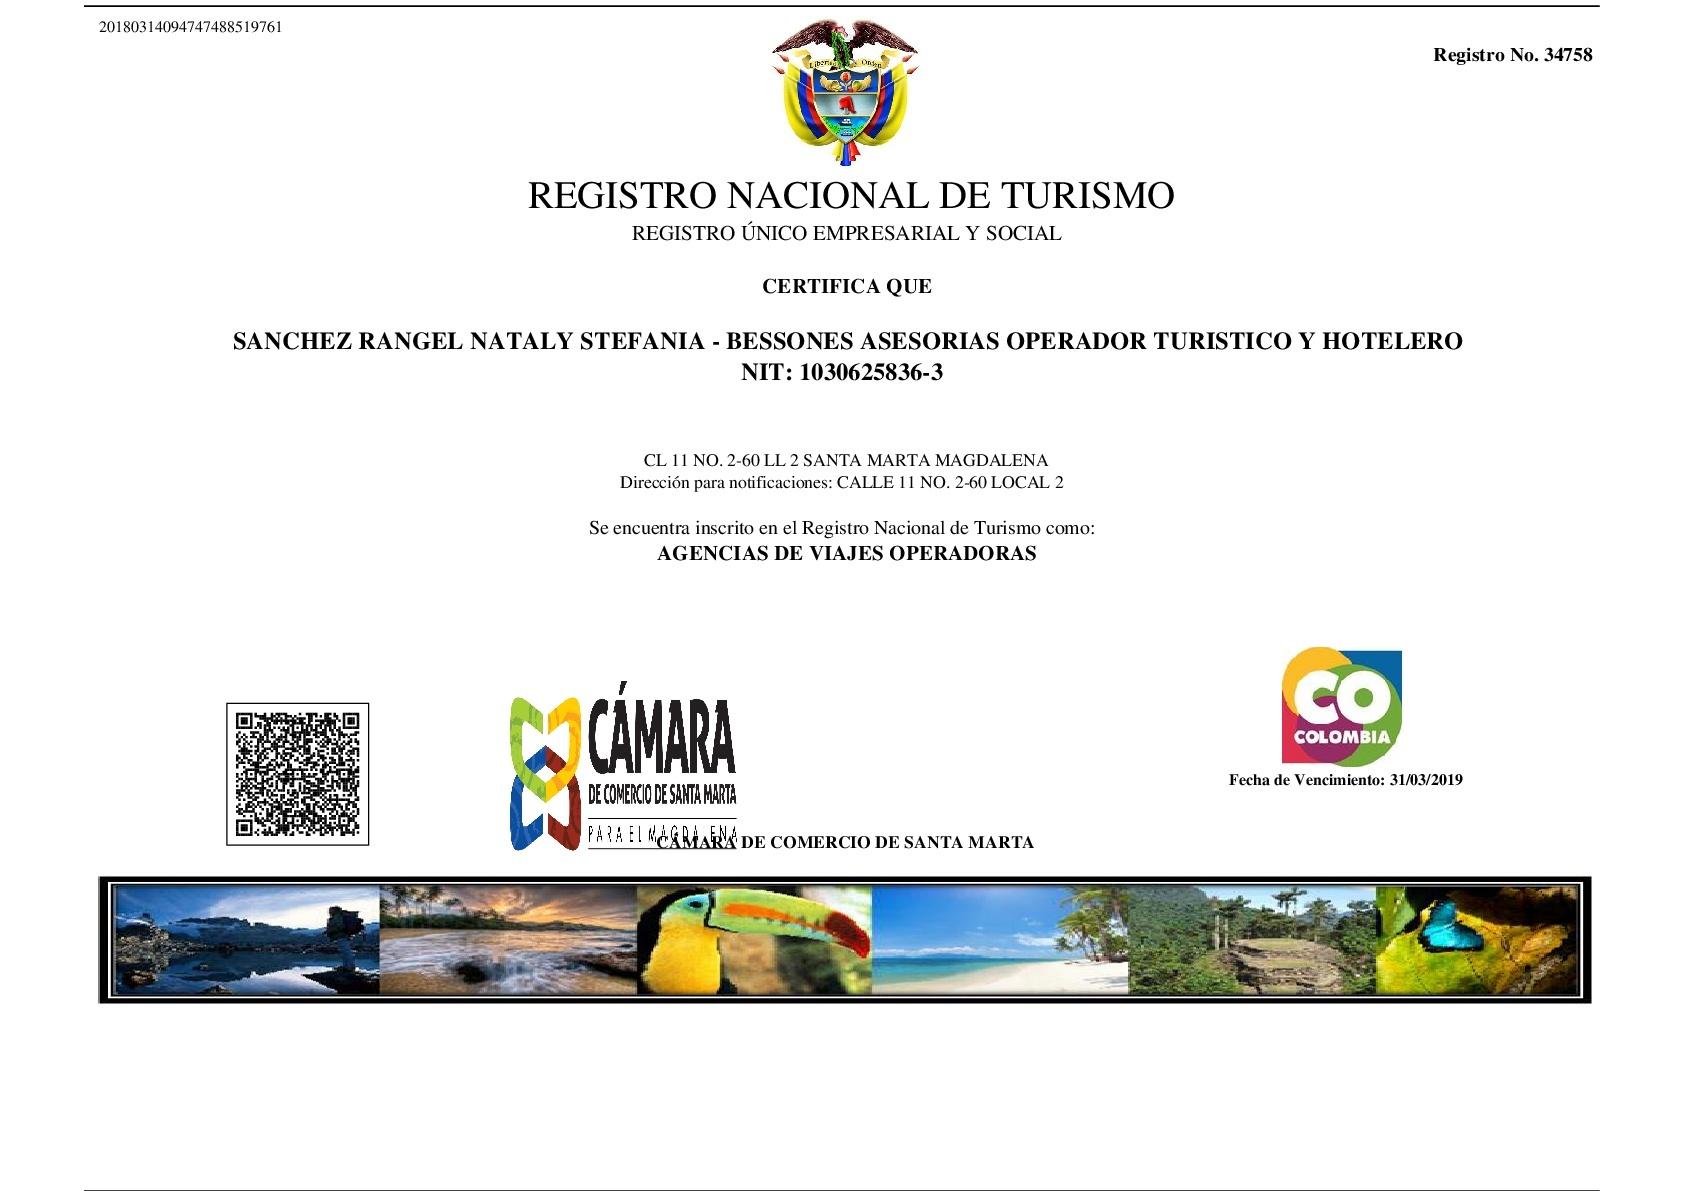 REGISTRO NACIONAL DE TURISMO ACTUALIZADO 2018-001